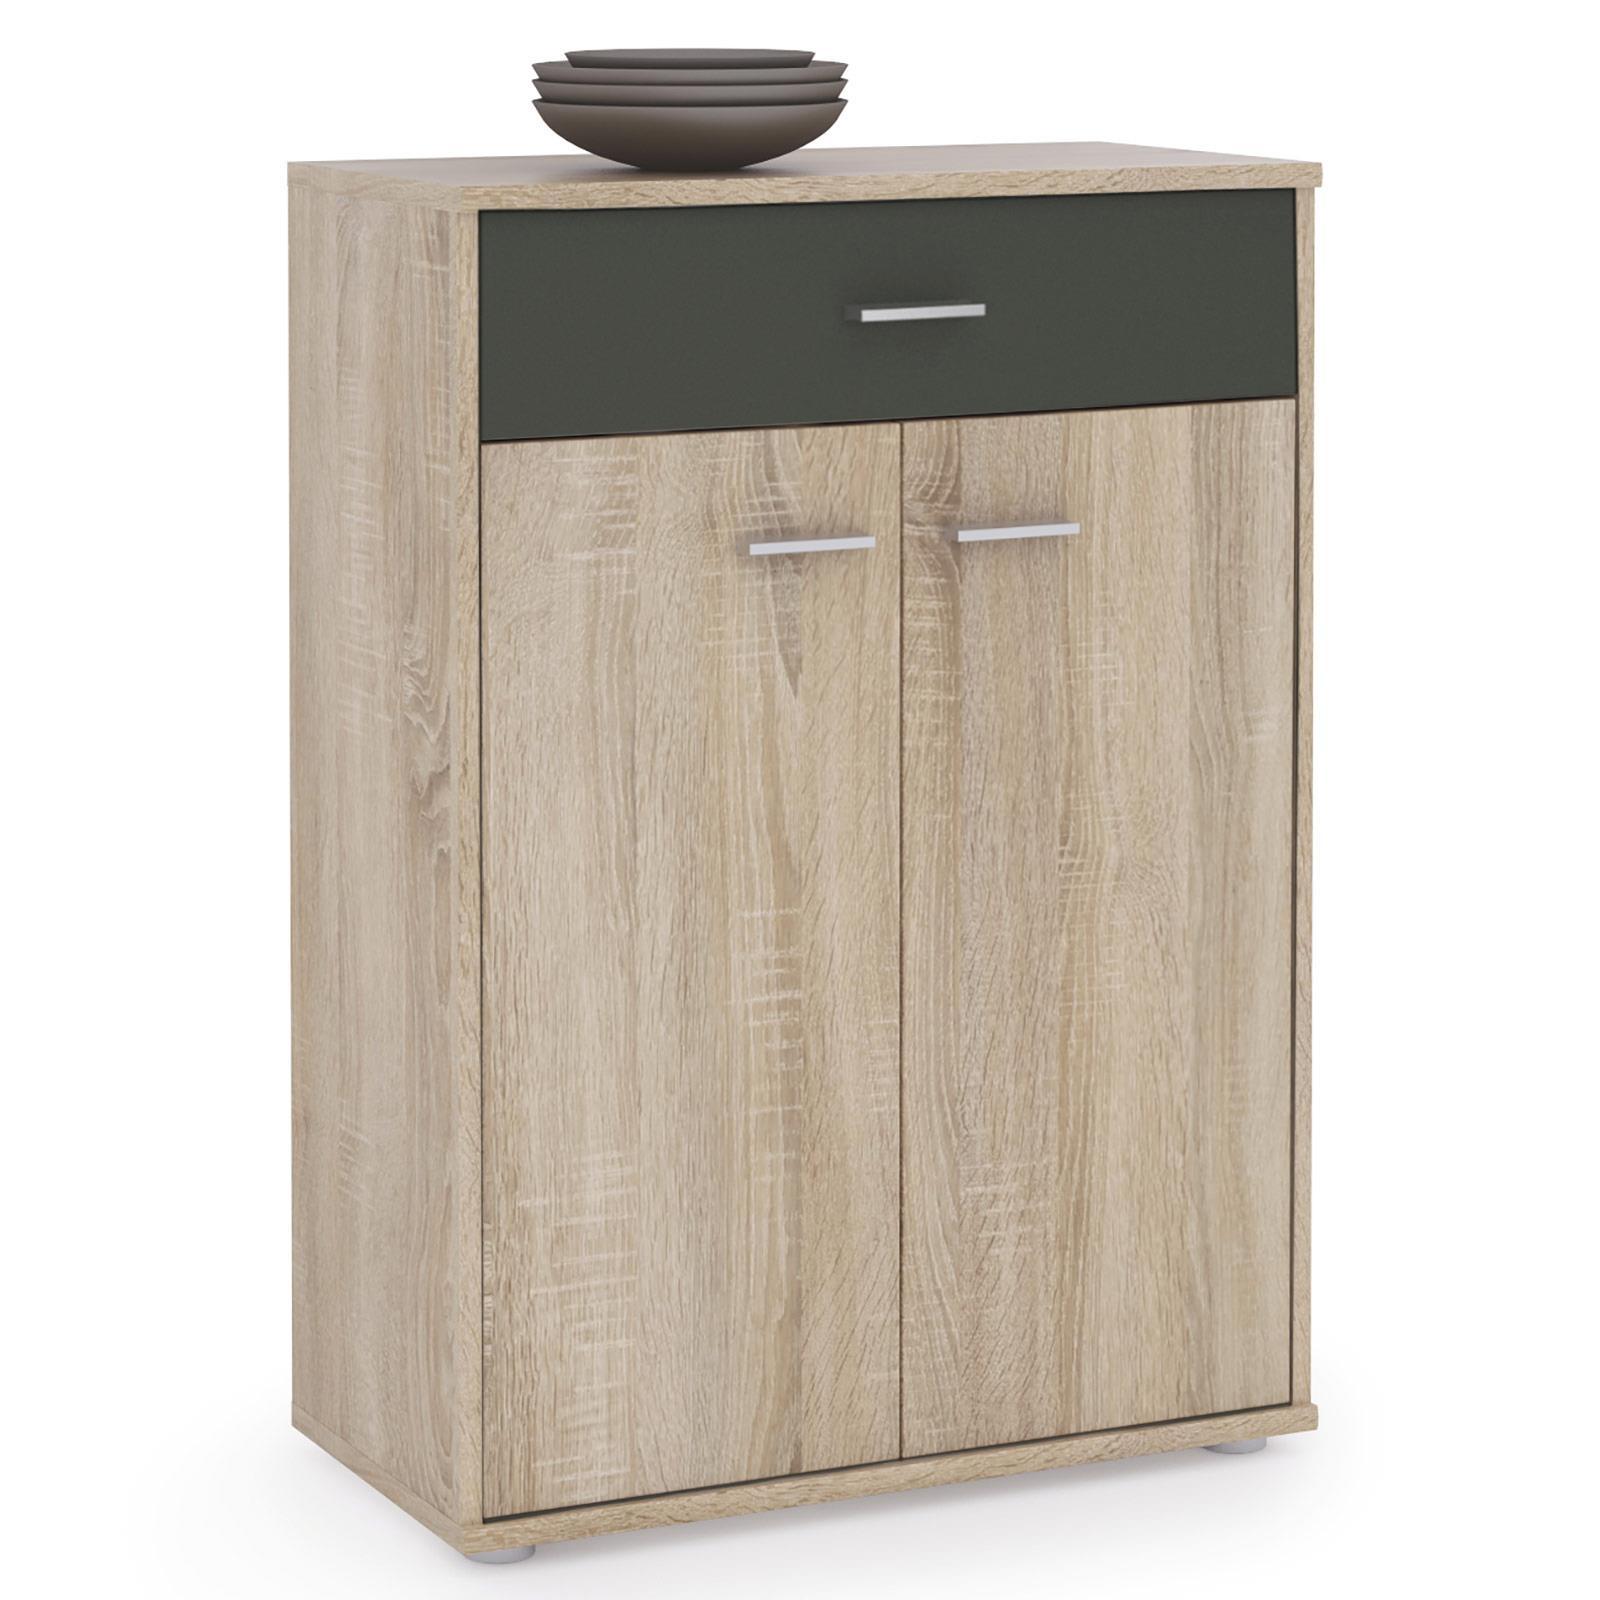 kommode tommy sonoma eiche grau 2 t ren 1 schublade caro m bel. Black Bedroom Furniture Sets. Home Design Ideas